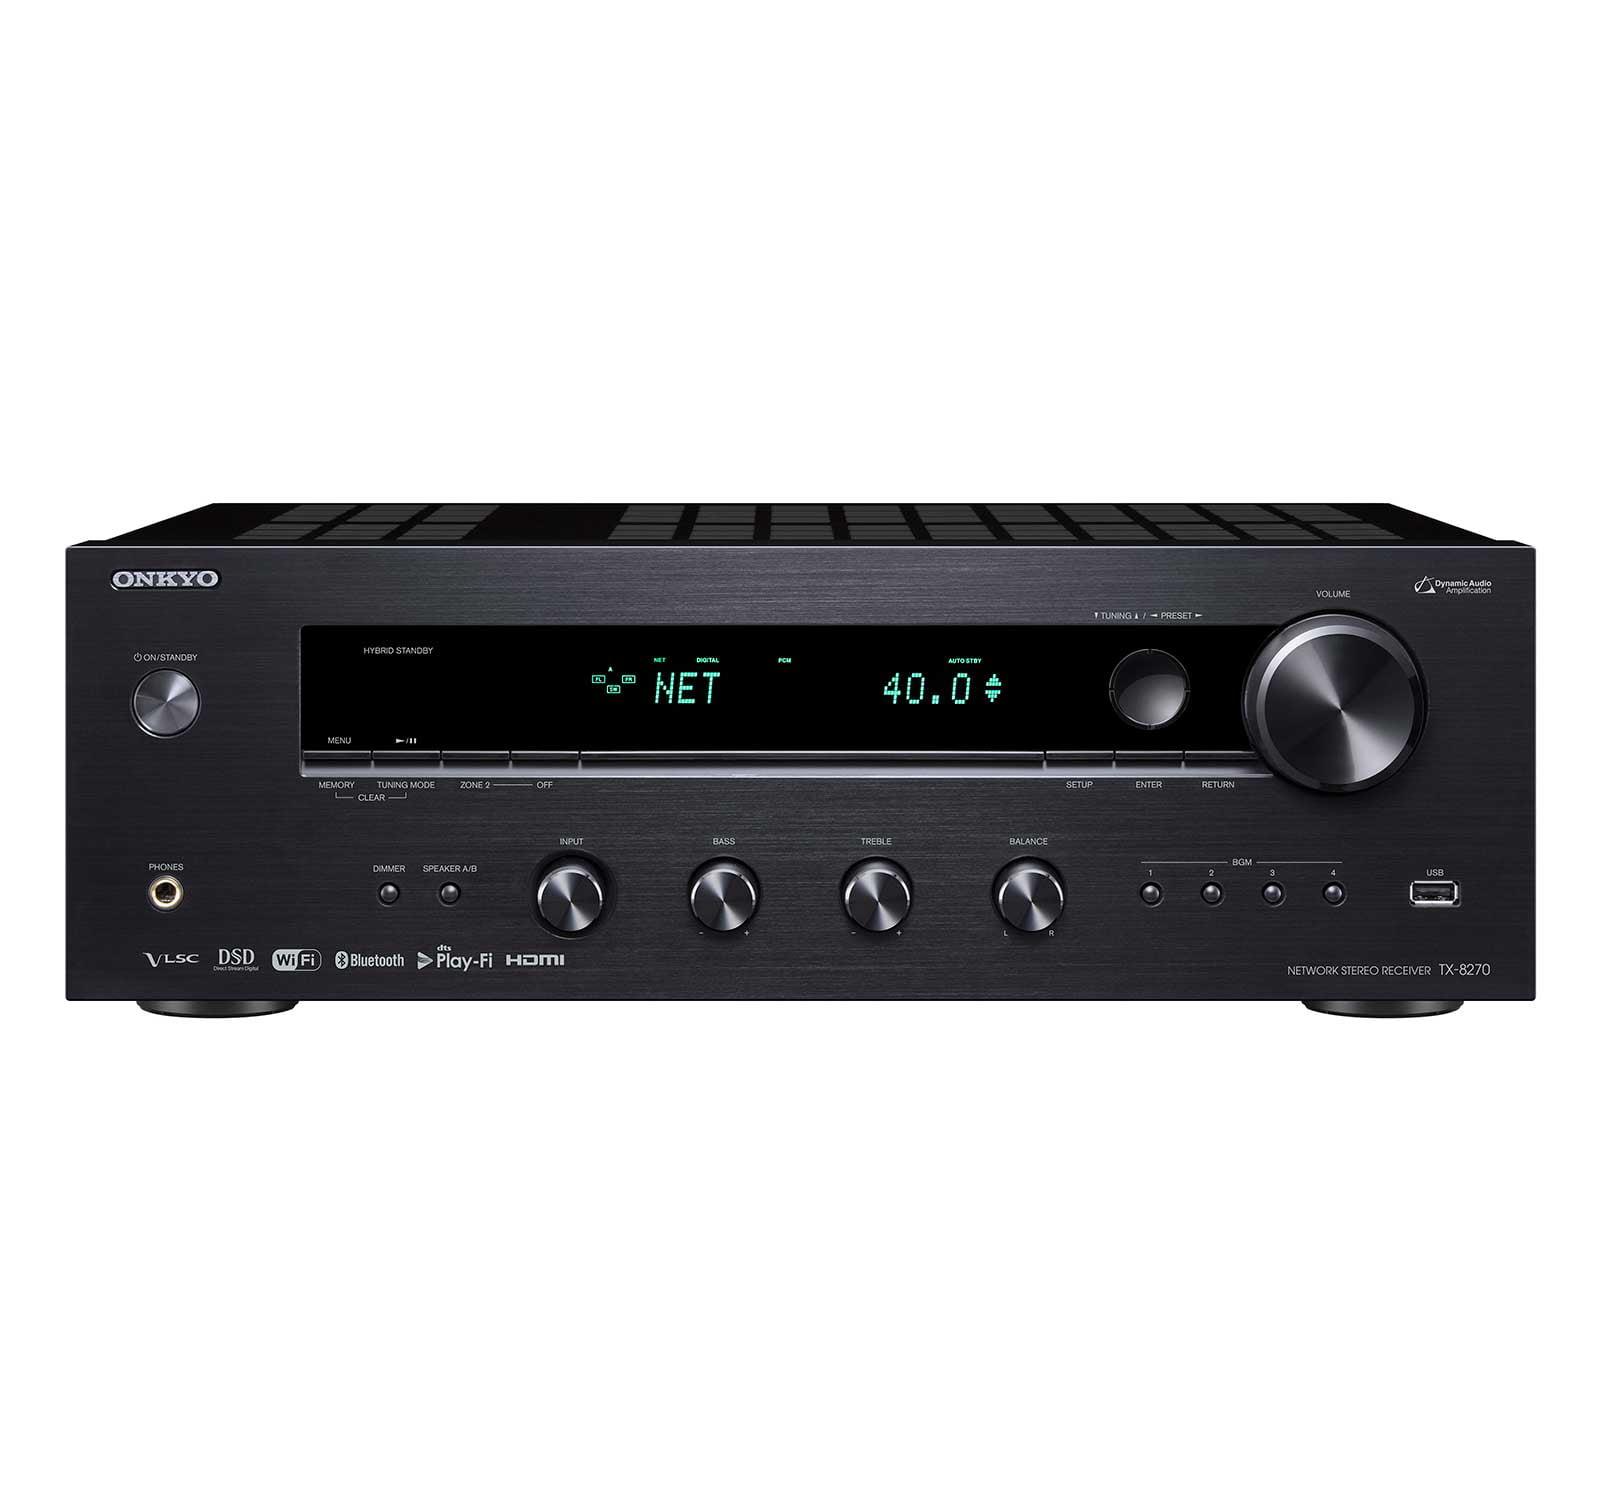 Onkyo TX-8270 Open Box Stereo Receiver by Onkyo